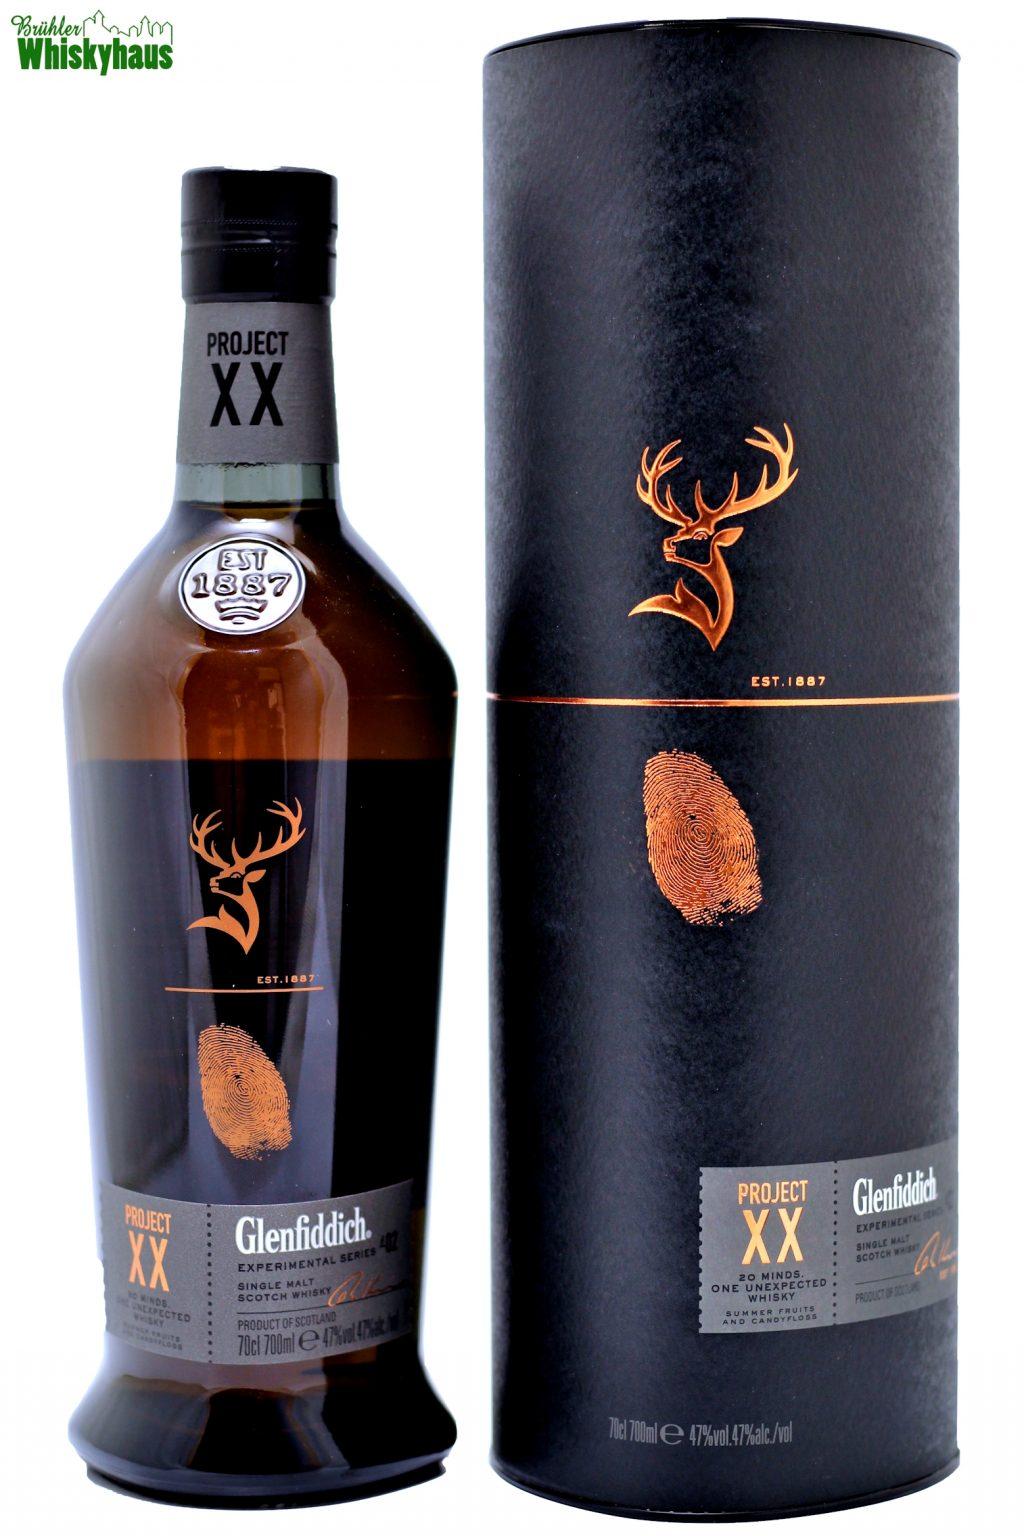 Glenfiddich - Project XX - Experimental Series #02 - Single Malt Scotch Whisky